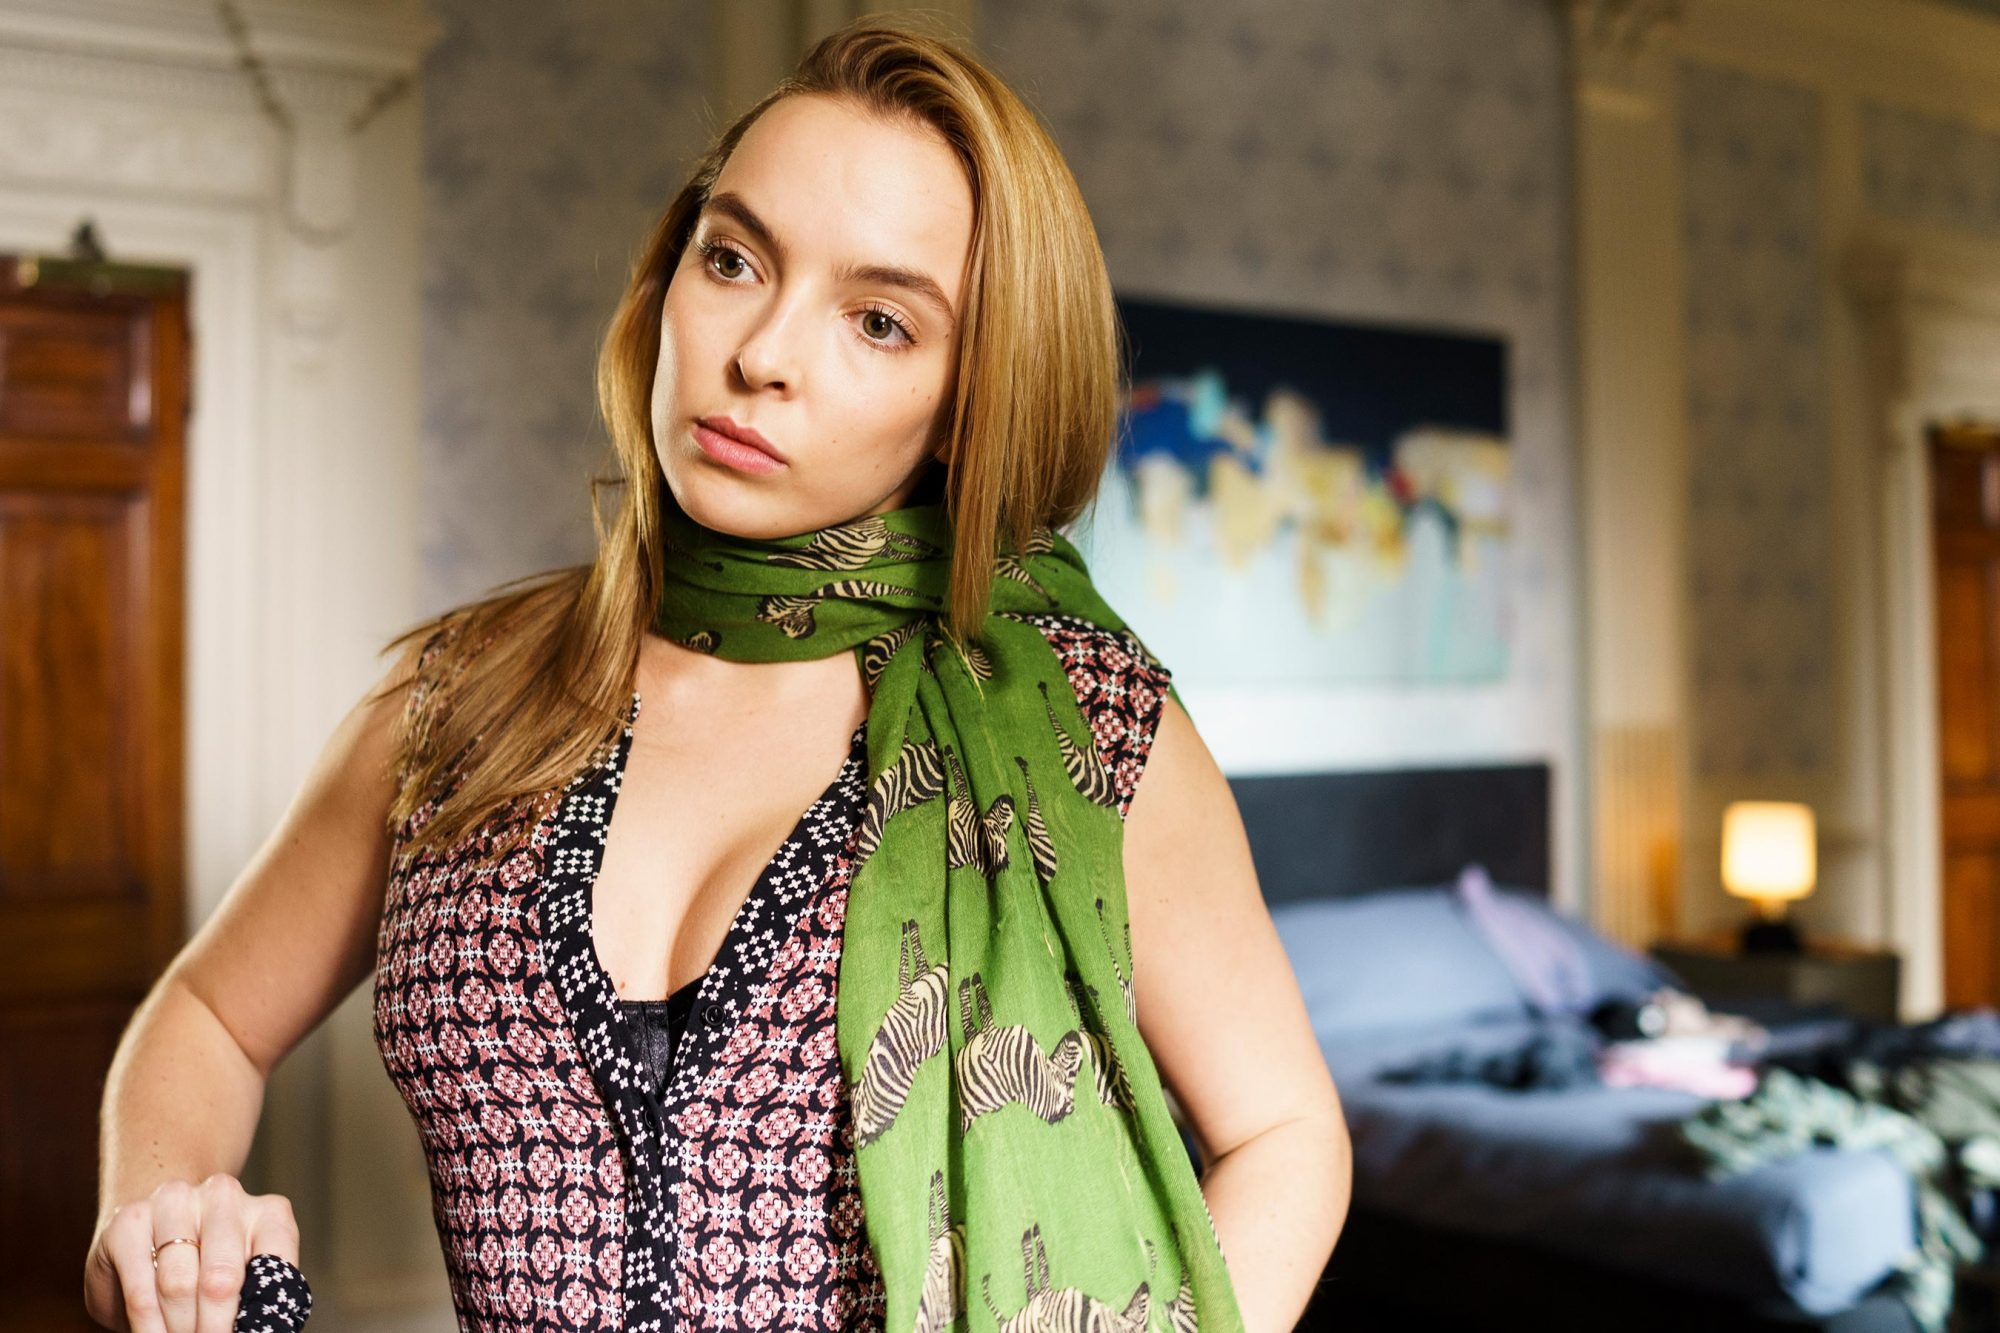 Killing Eve Season 1Jodie Comer as Villanelle